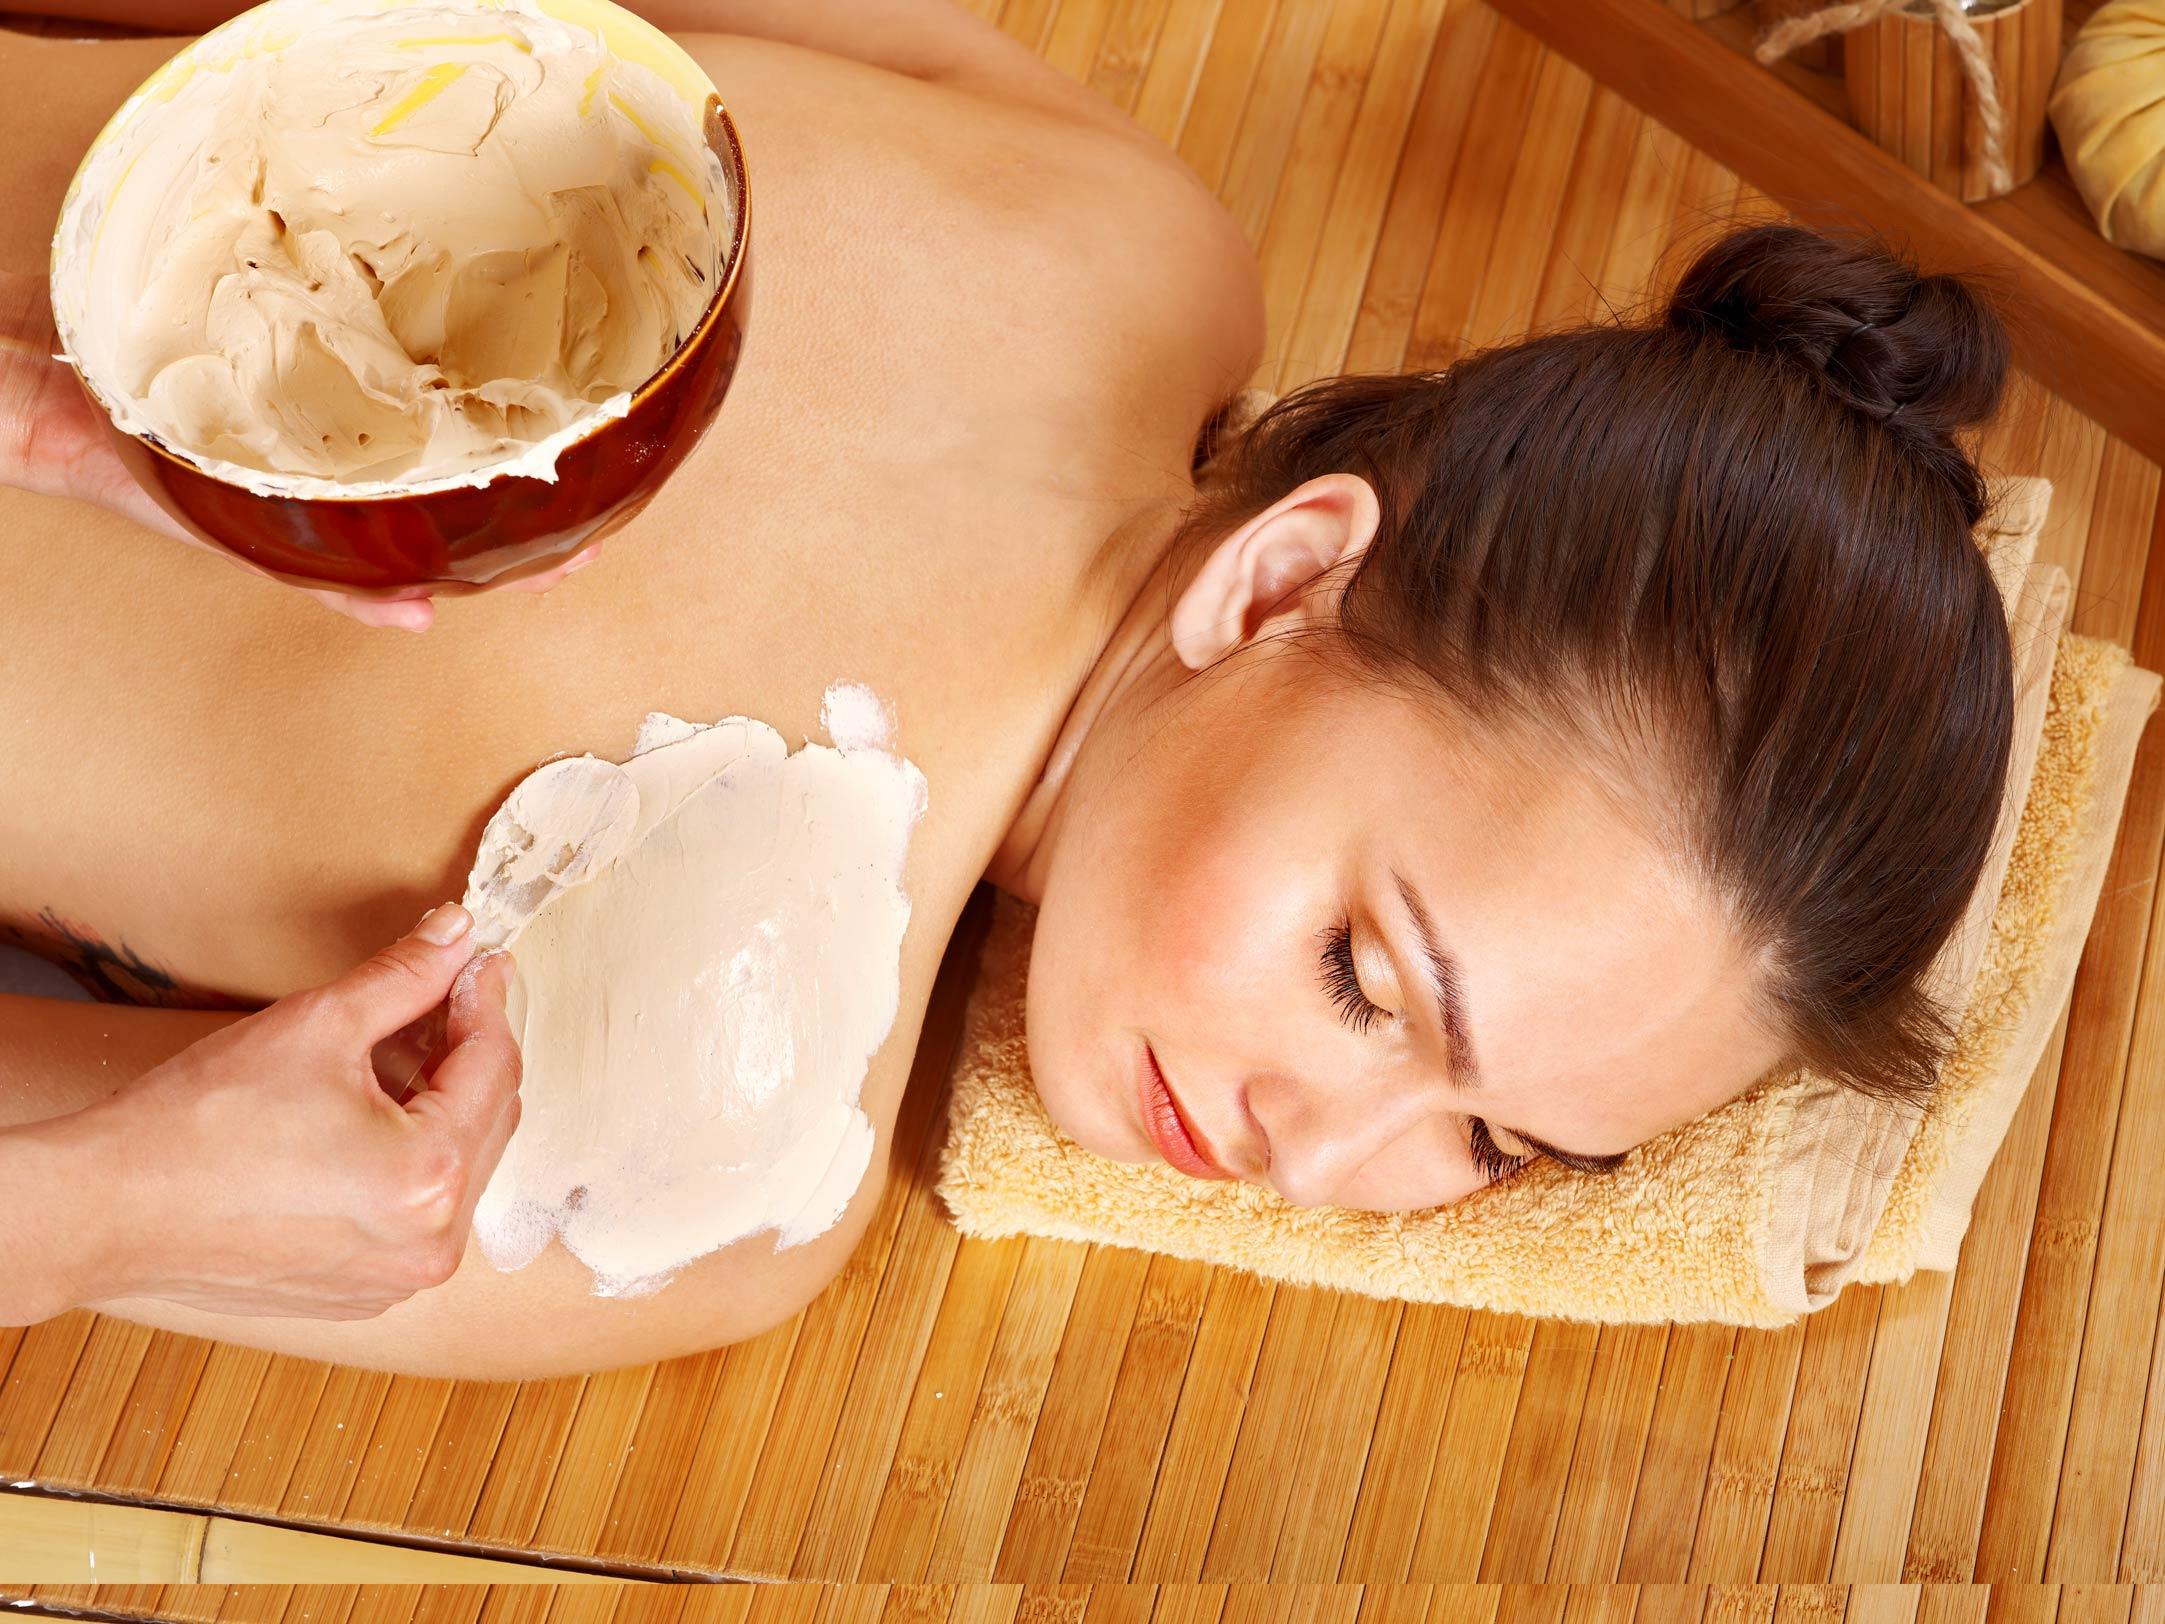 Фото массажа в бане 6 фотография